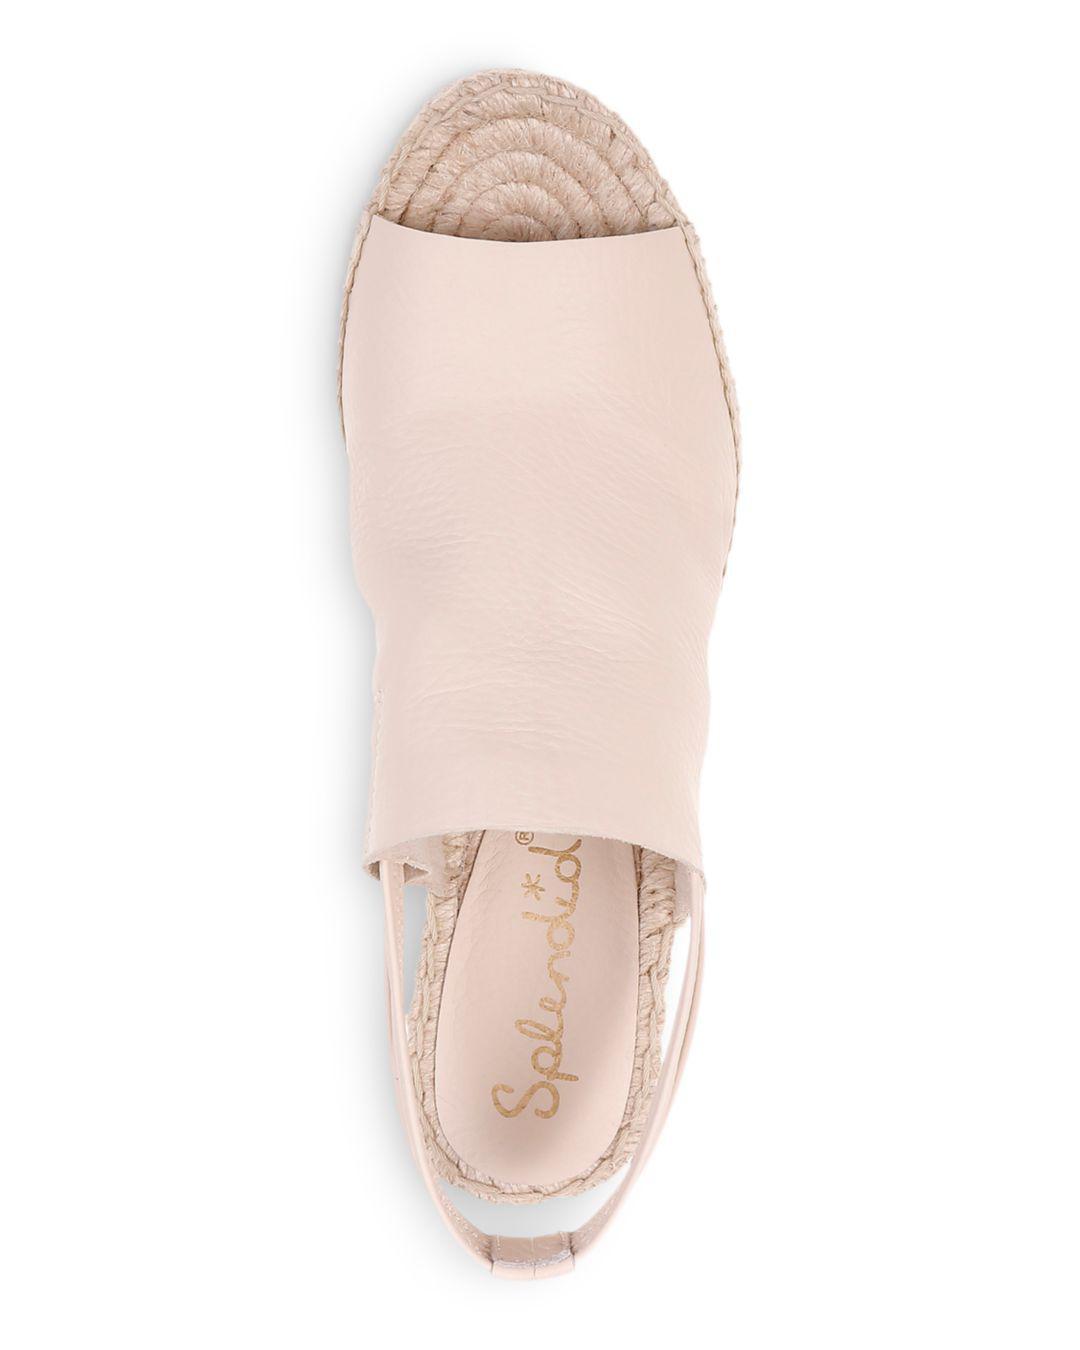 8f2e1bb8049 Splendid Women's Simon Leather Espadrille Wedge Sandals - Lyst